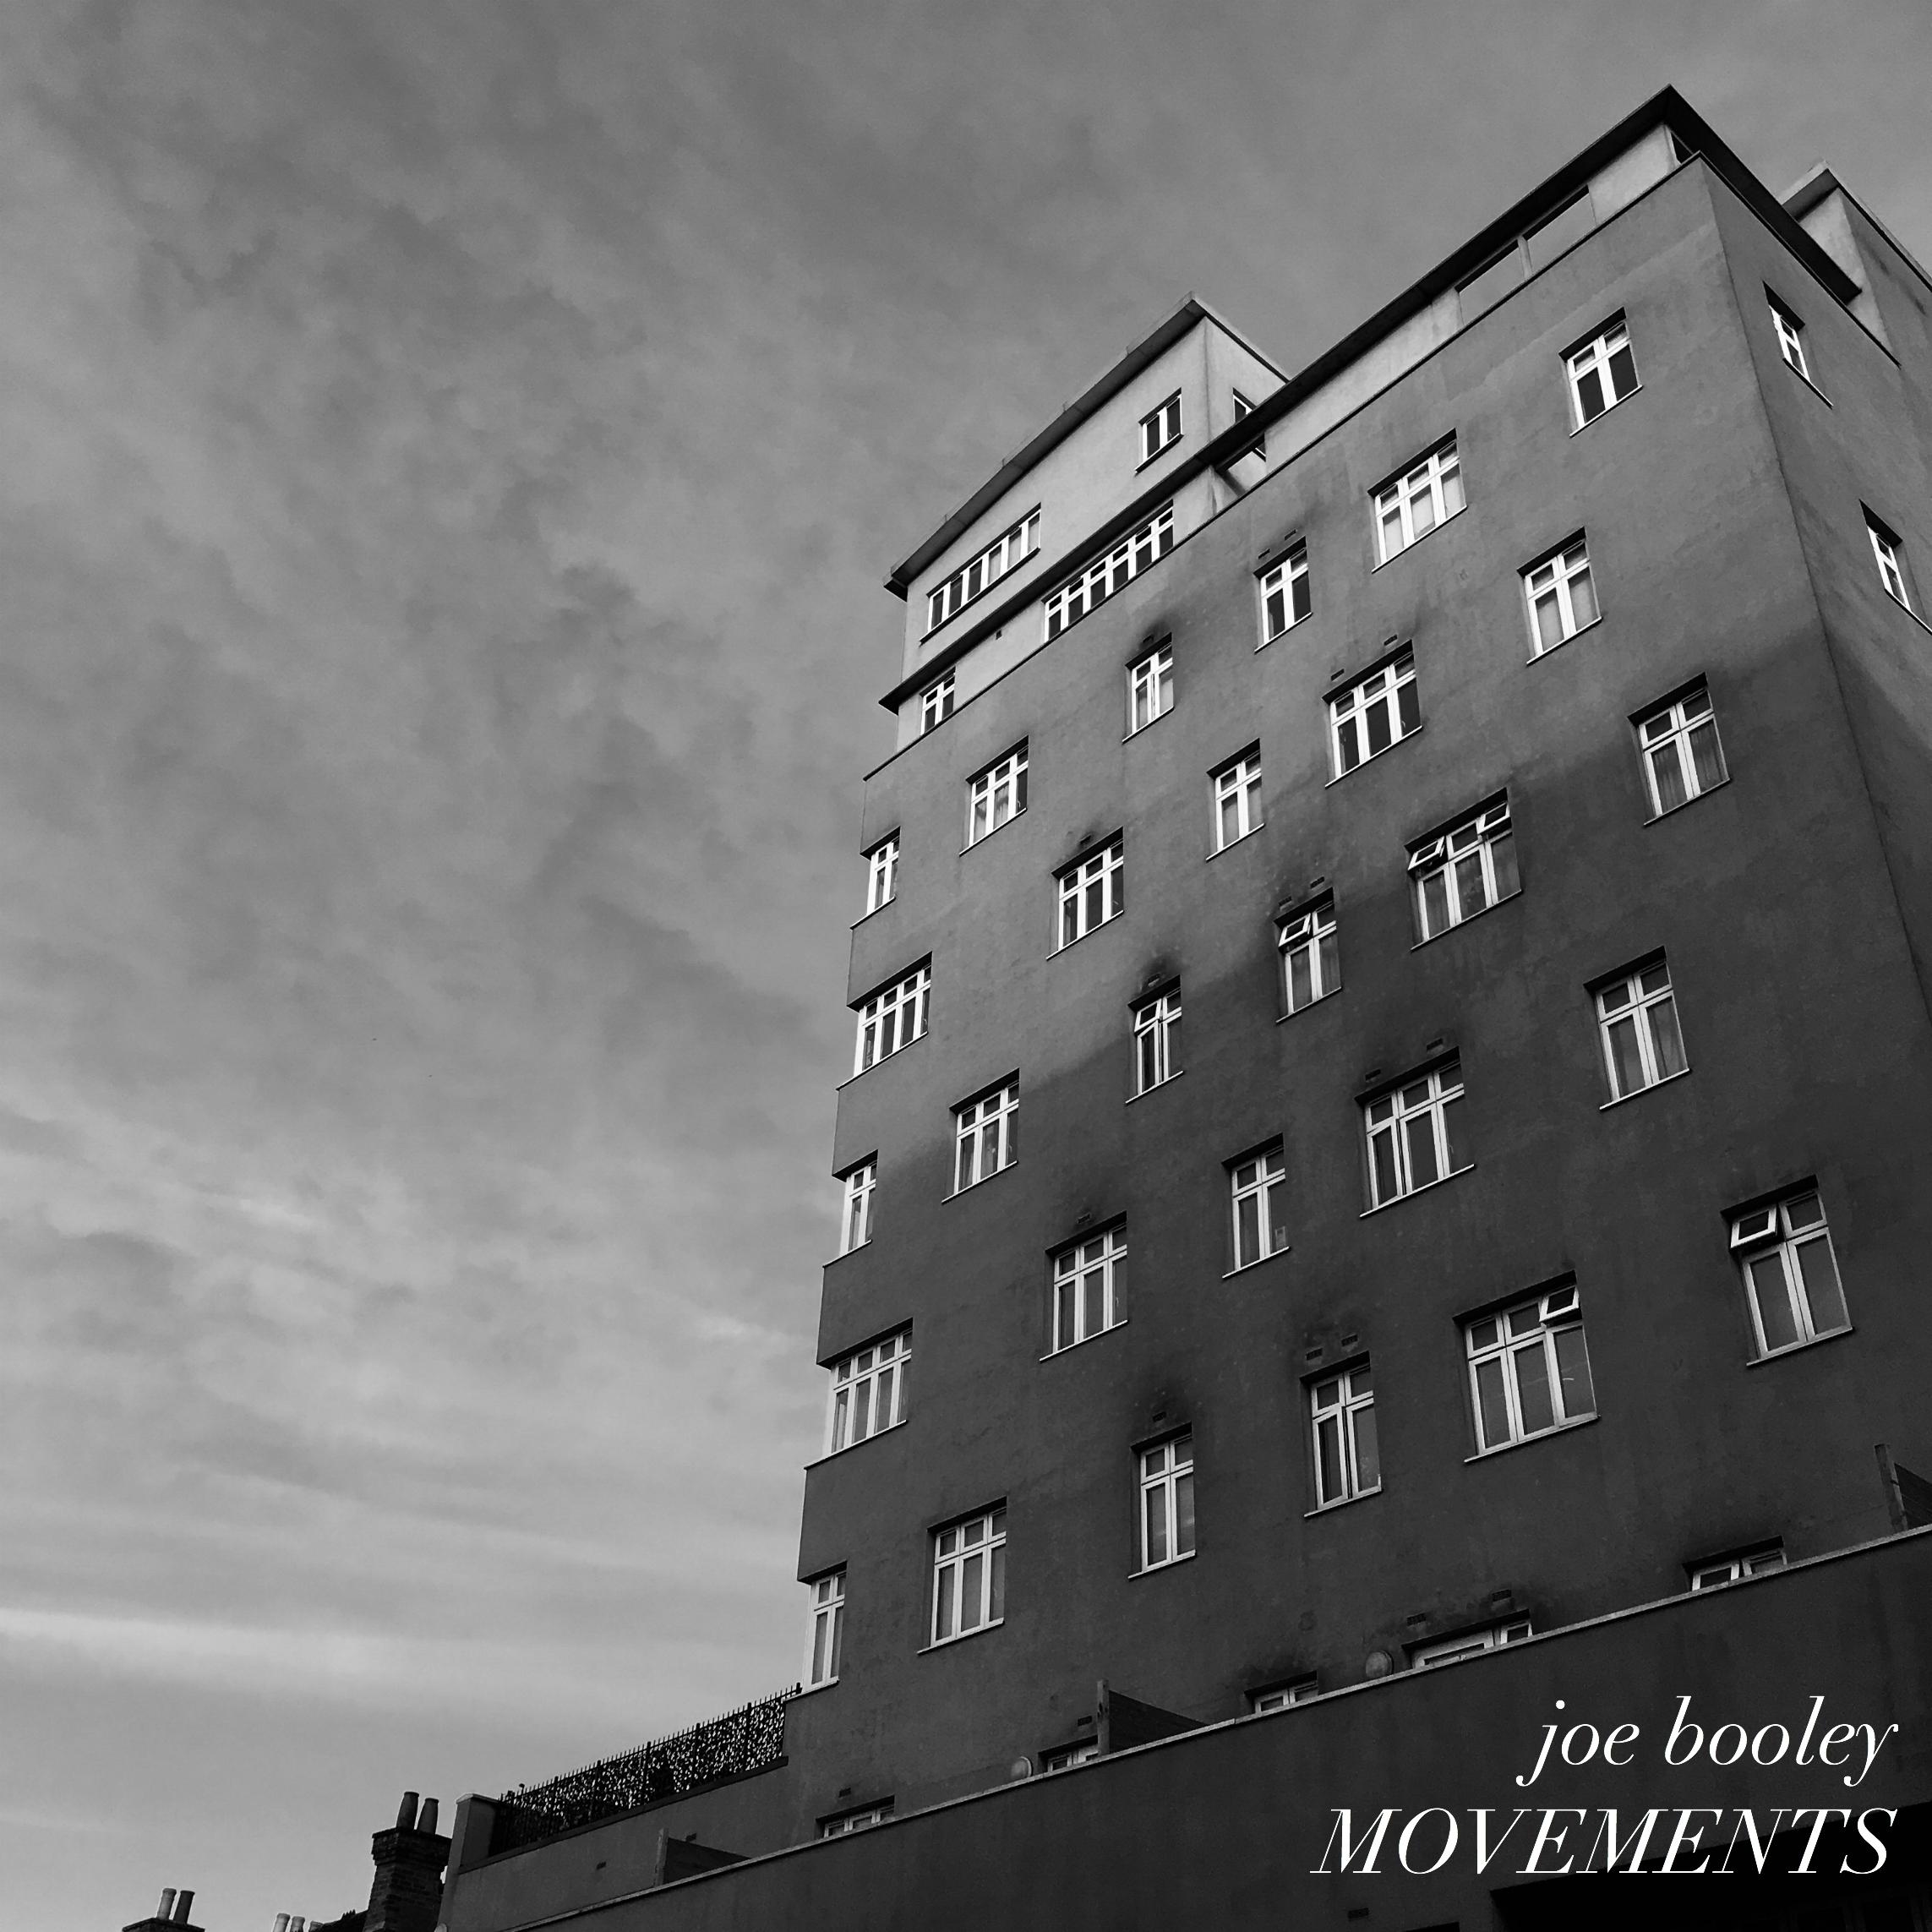 Joe Booley - MOVEMENTS